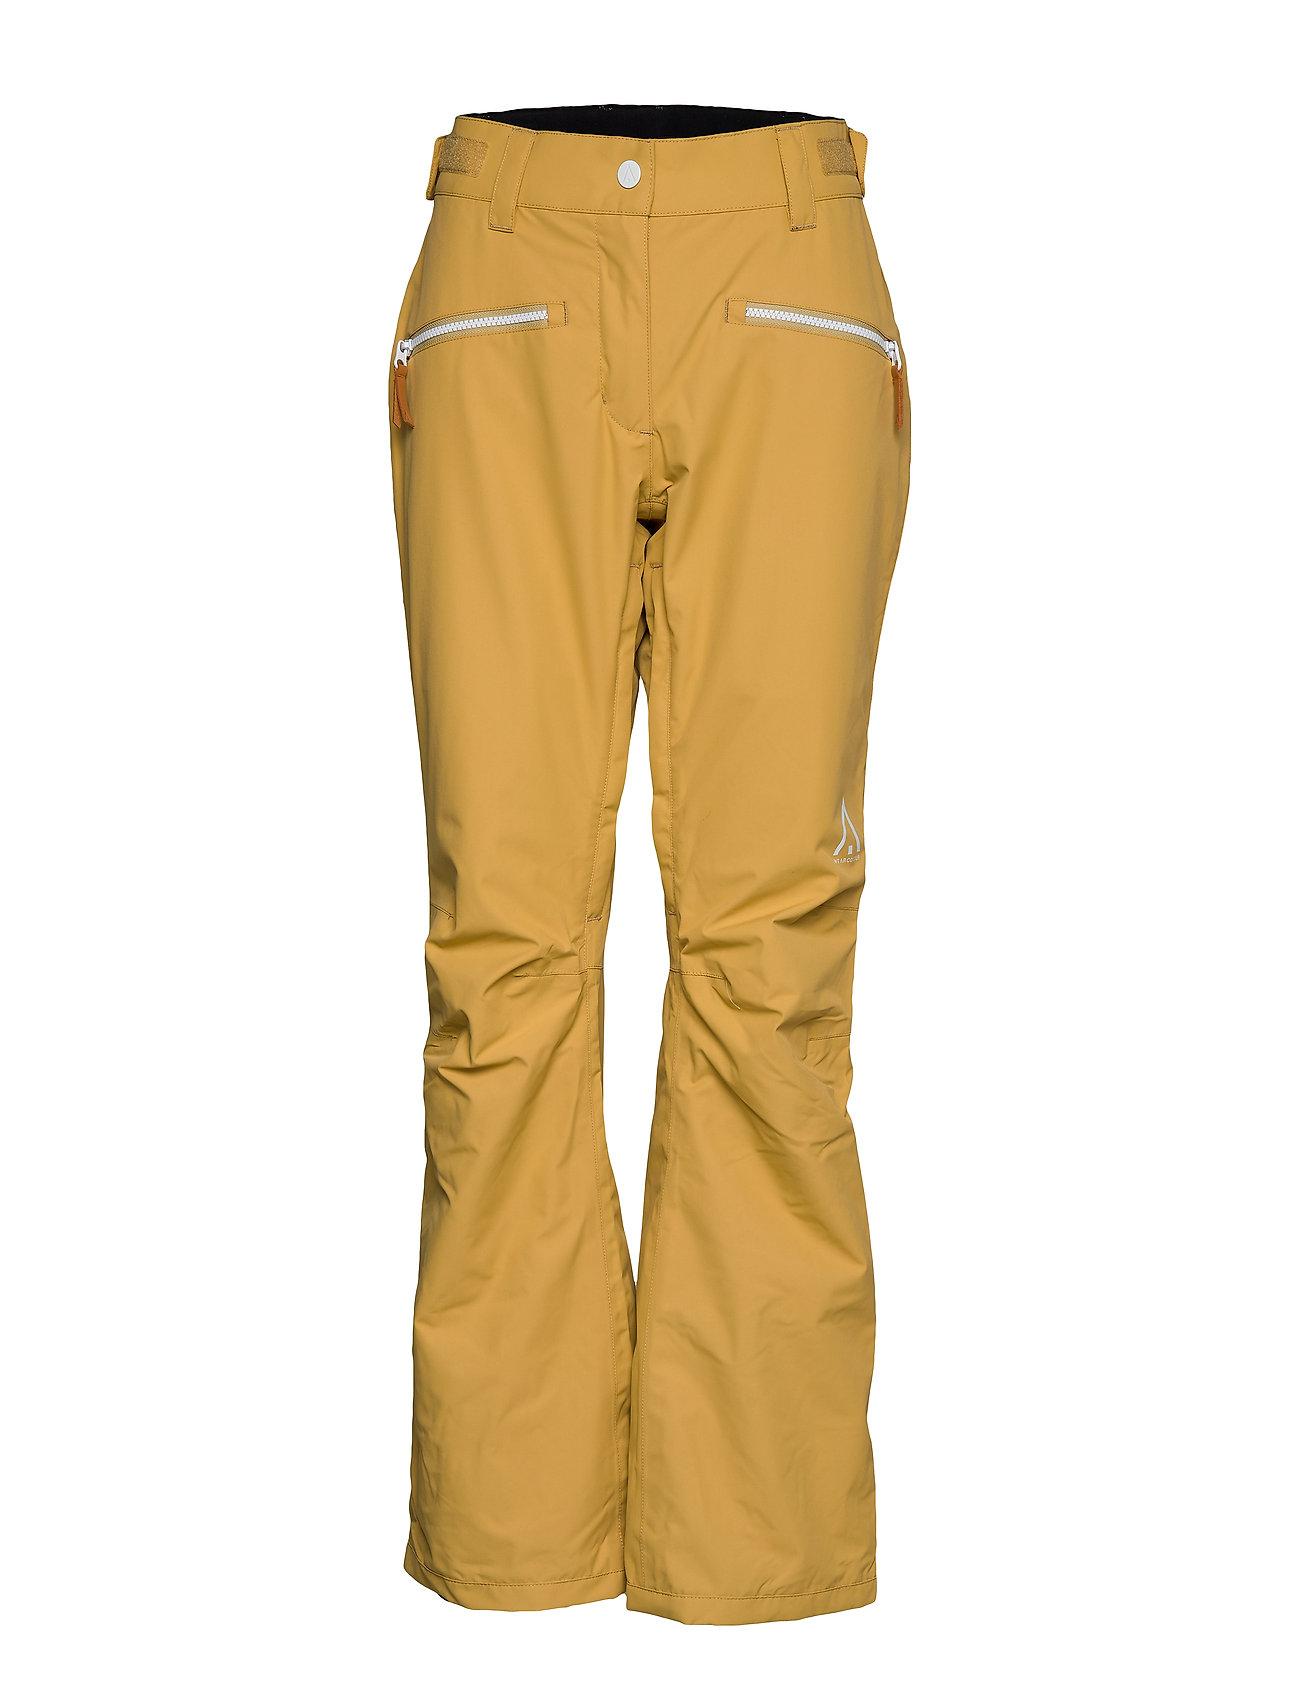 Image of Cork Pant Sport Pants Gul WearColour (3261451537)